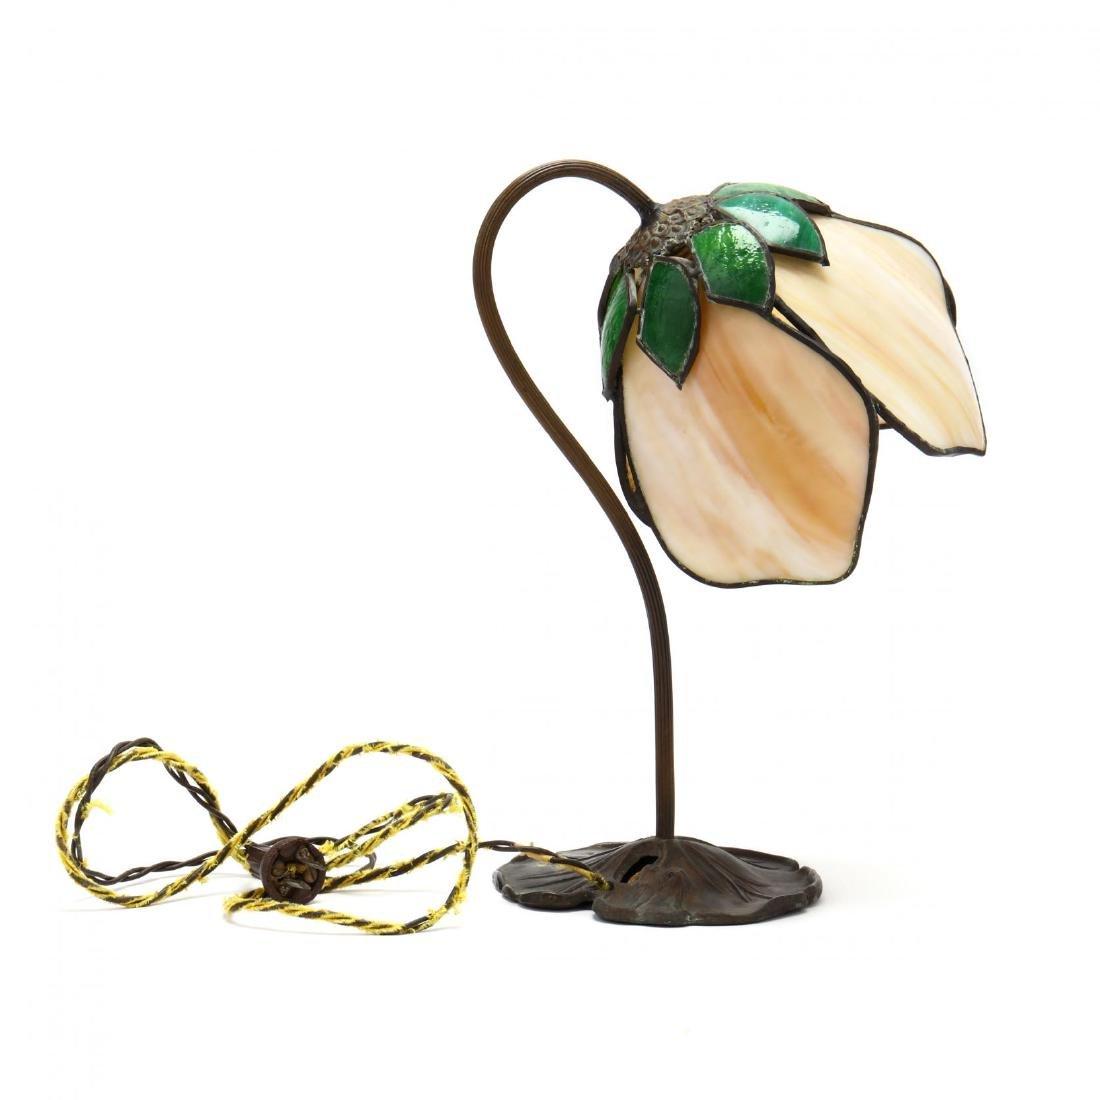 Vintage Slag Glass Tulip Form Table Lamp - 4